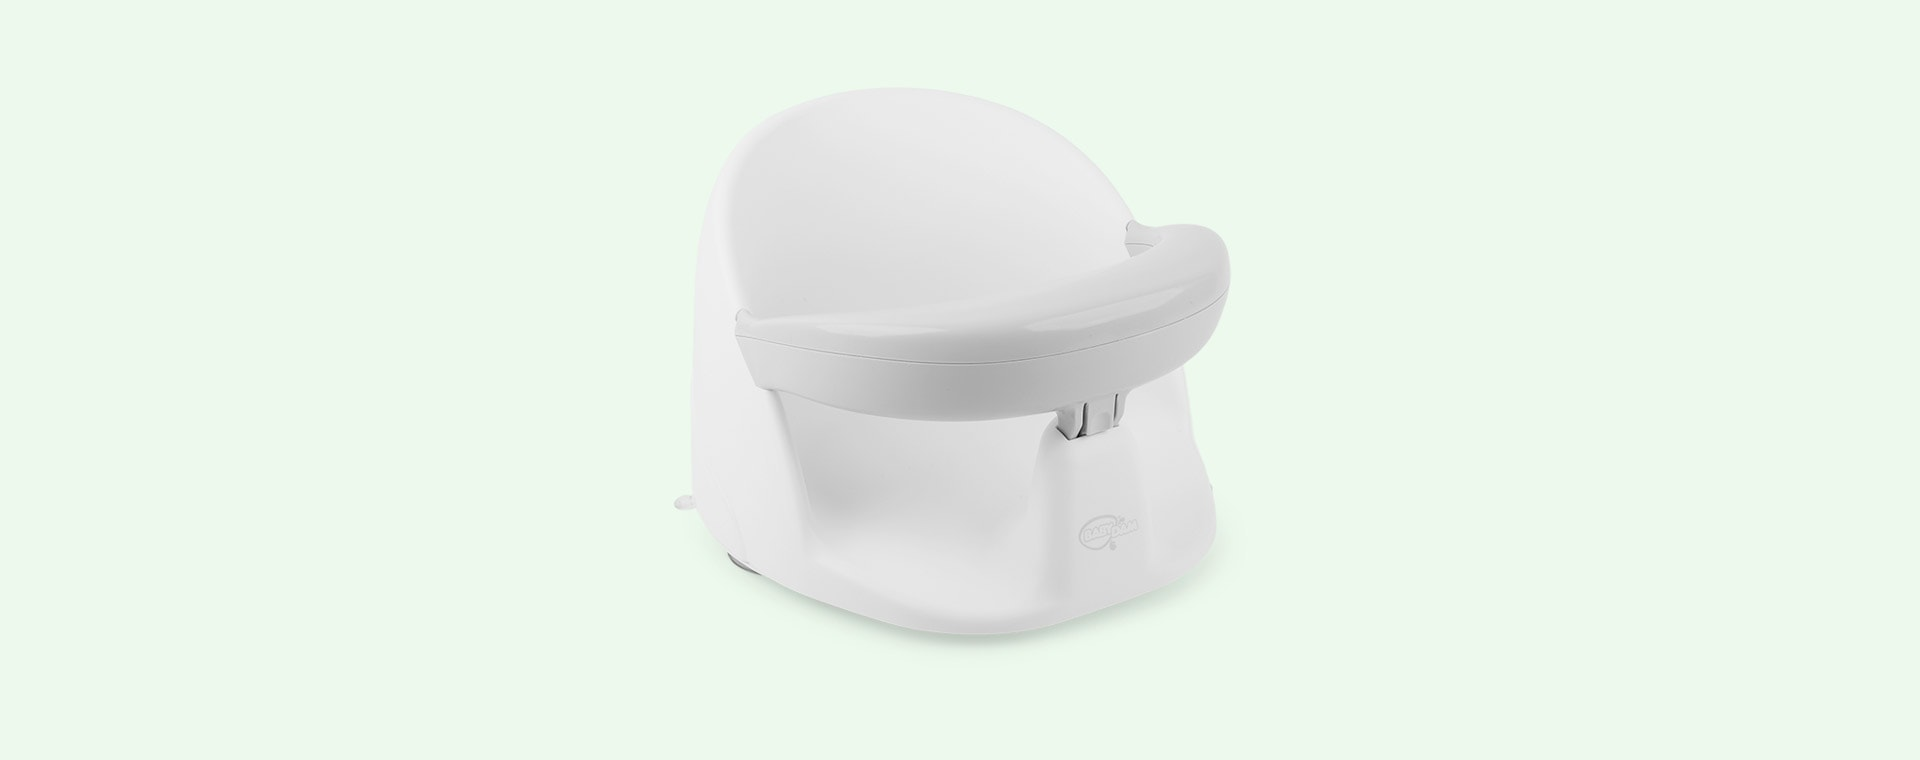 Grey/White BabyDam Orbital Bath Seat